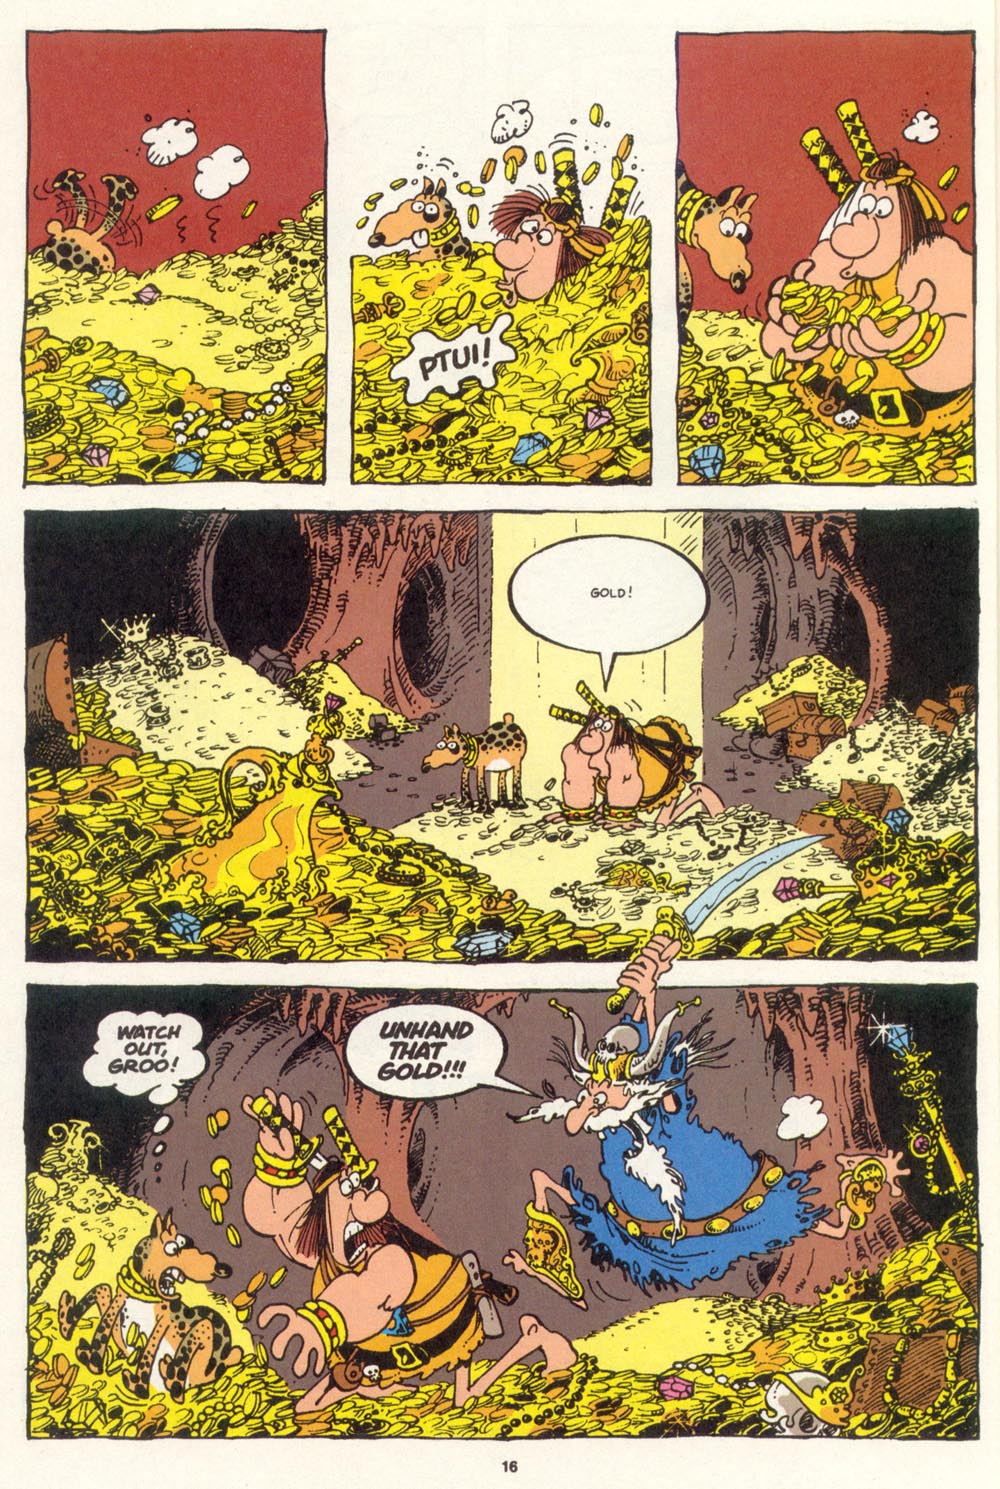 Read online Sergio Aragonés Groo the Wanderer comic -  Issue #100 - 17